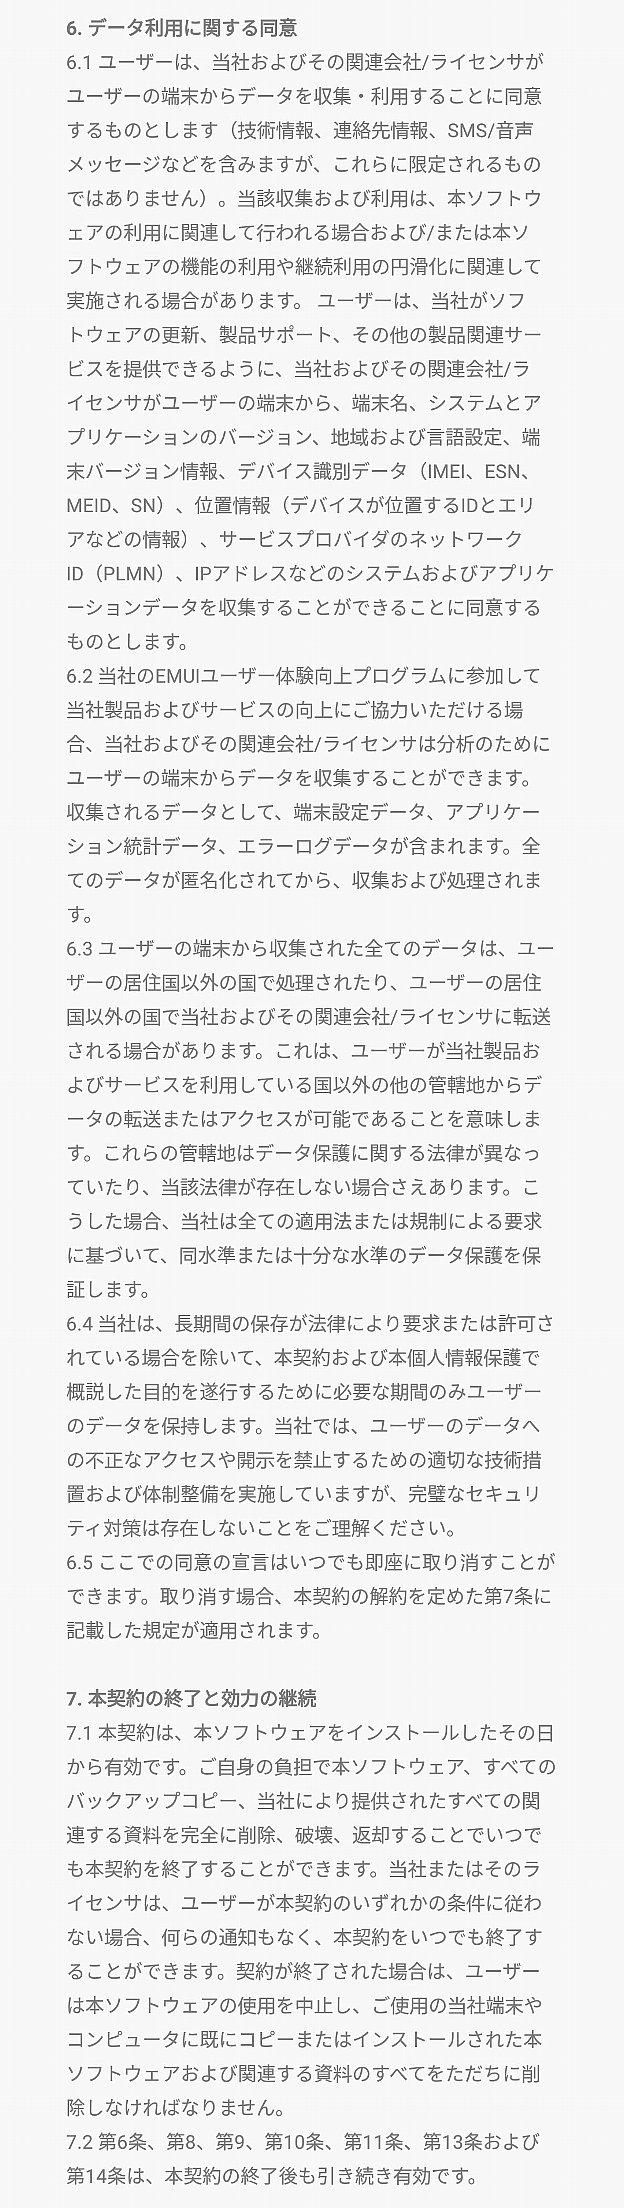 Huawei P9の利用規約抜粋